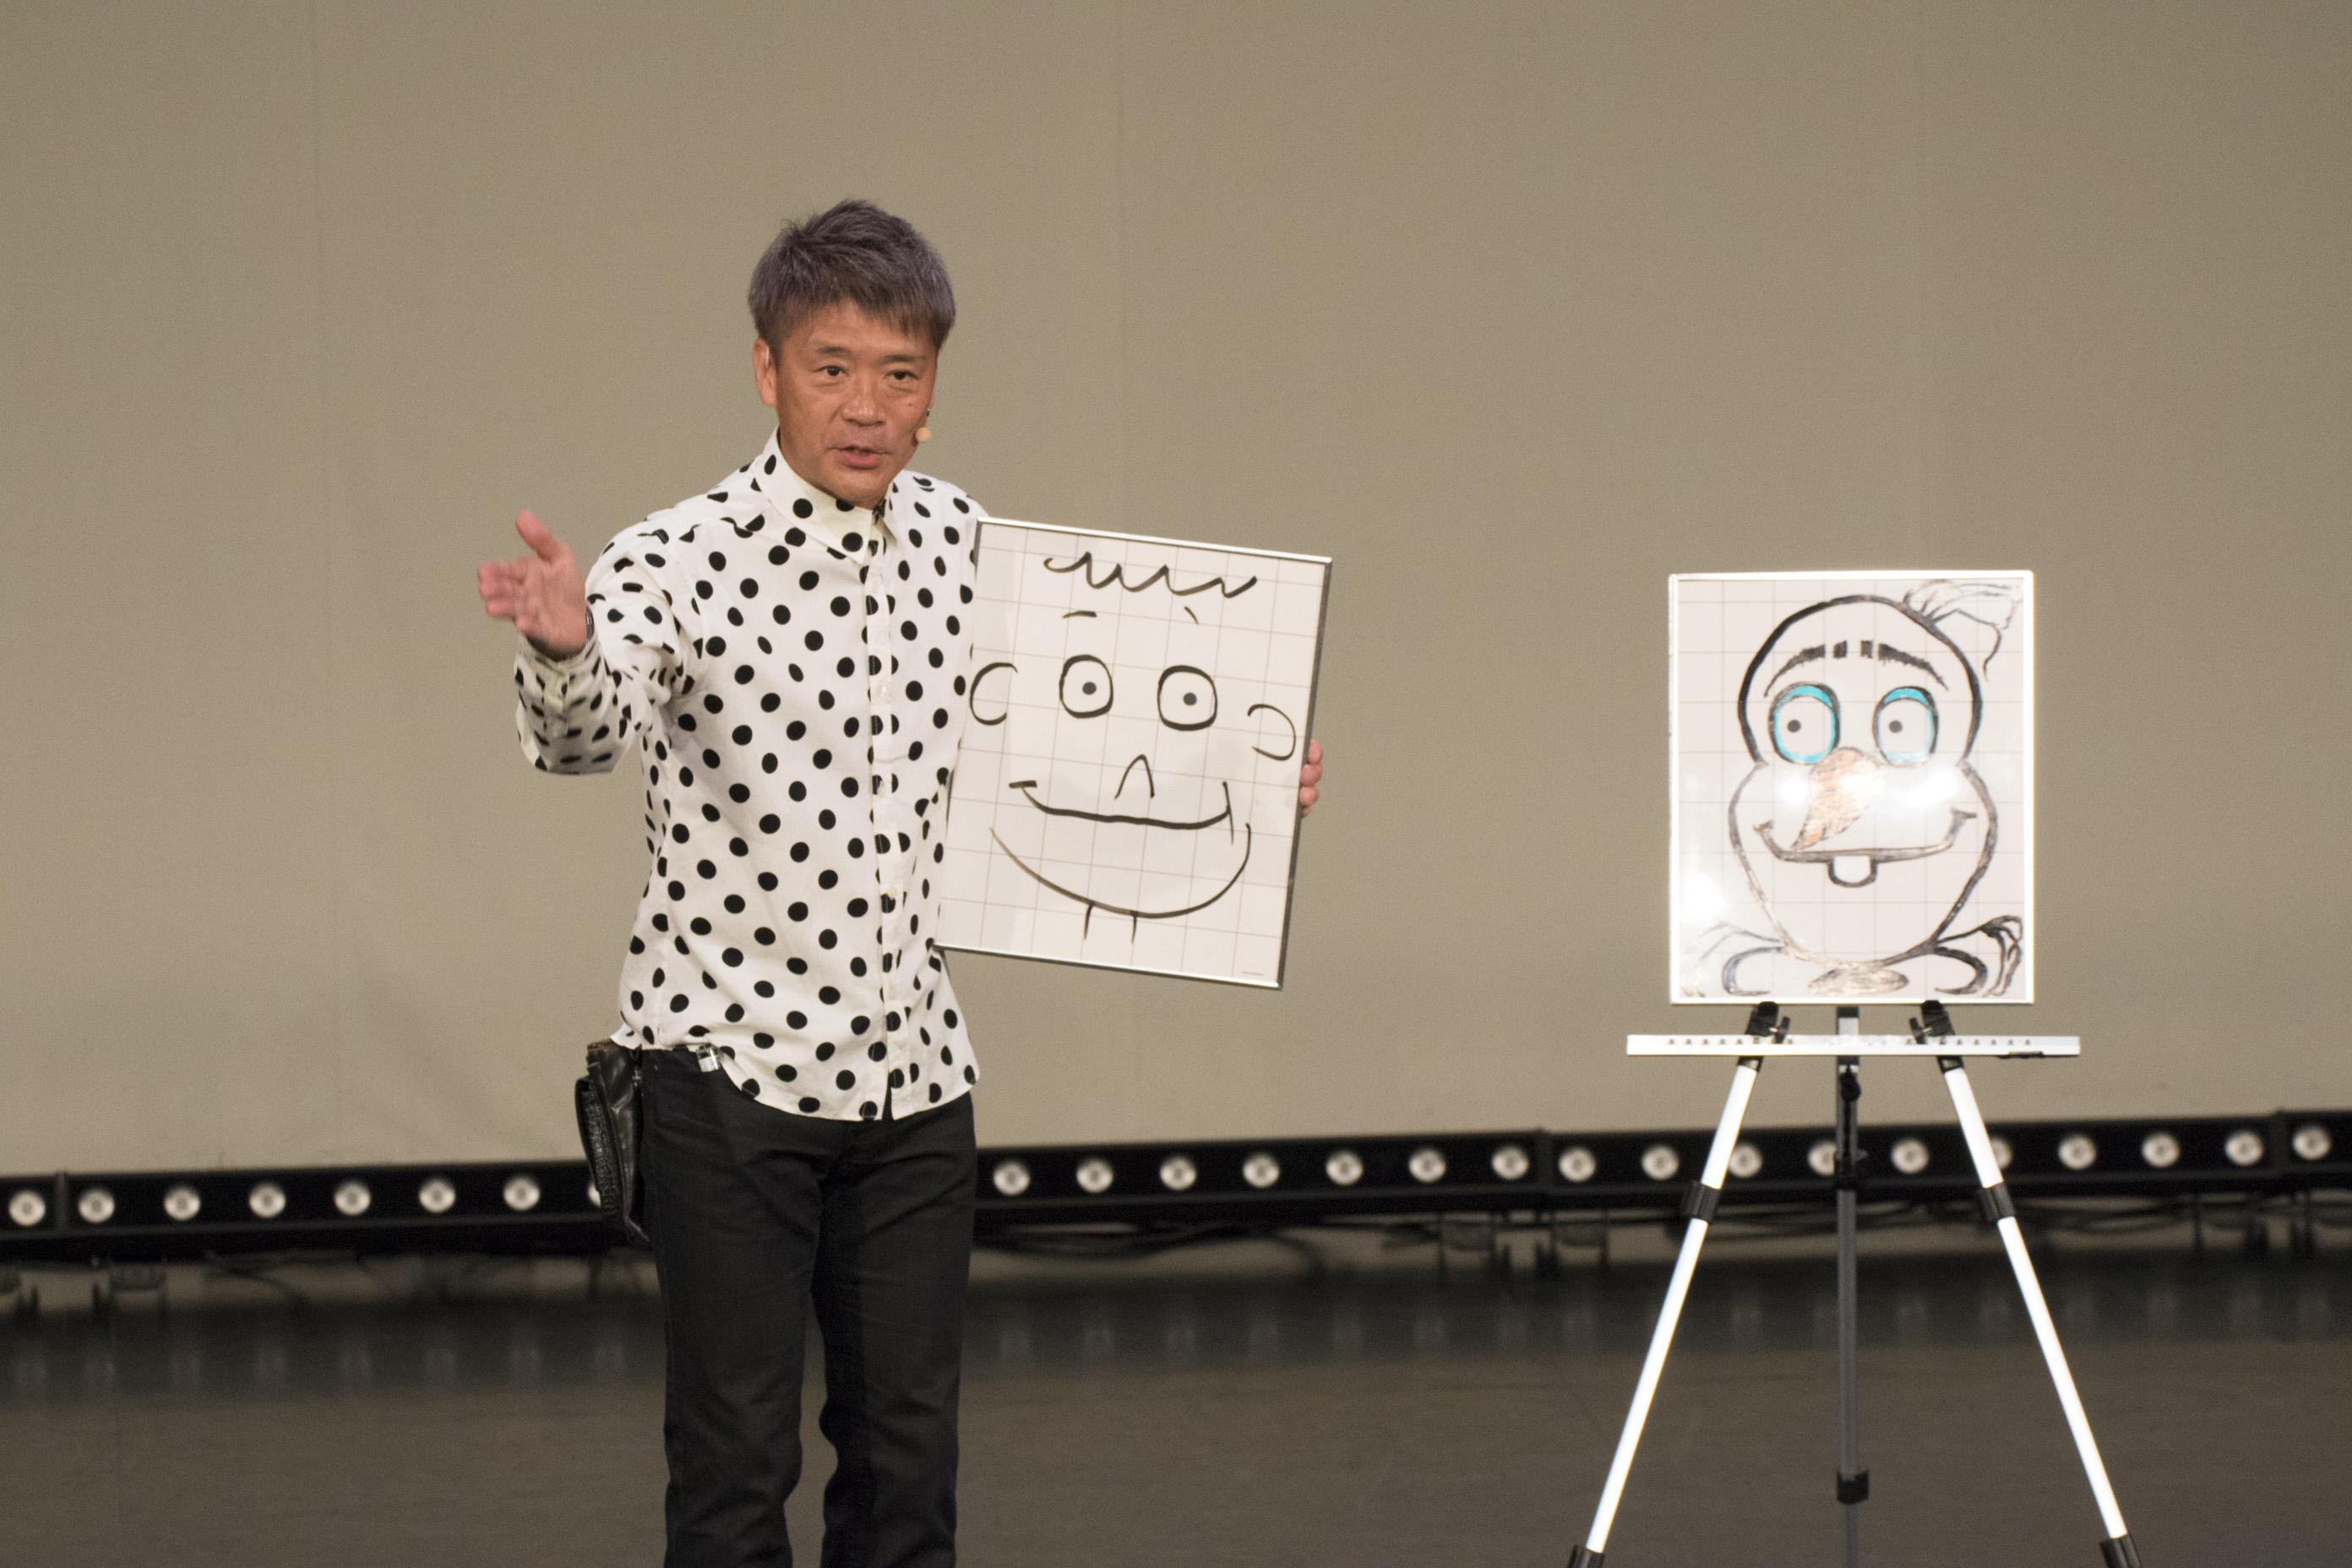 http://news.yoshimoto.co.jp/20170729093153-37ca297dc1c2b4a7805dafef9d157188eebf59c5.jpg